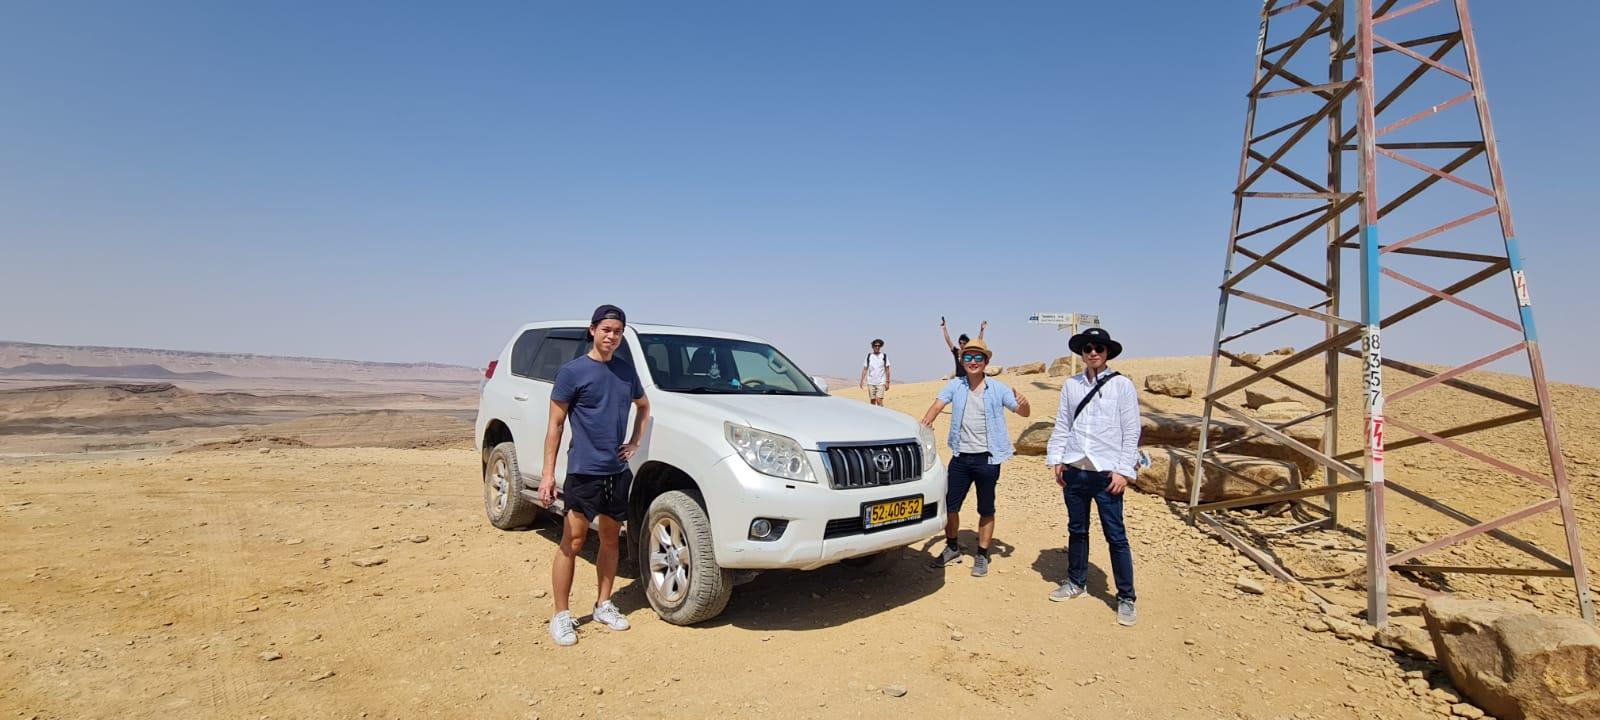 Negev Desert Jeep Tours & Safaris_2